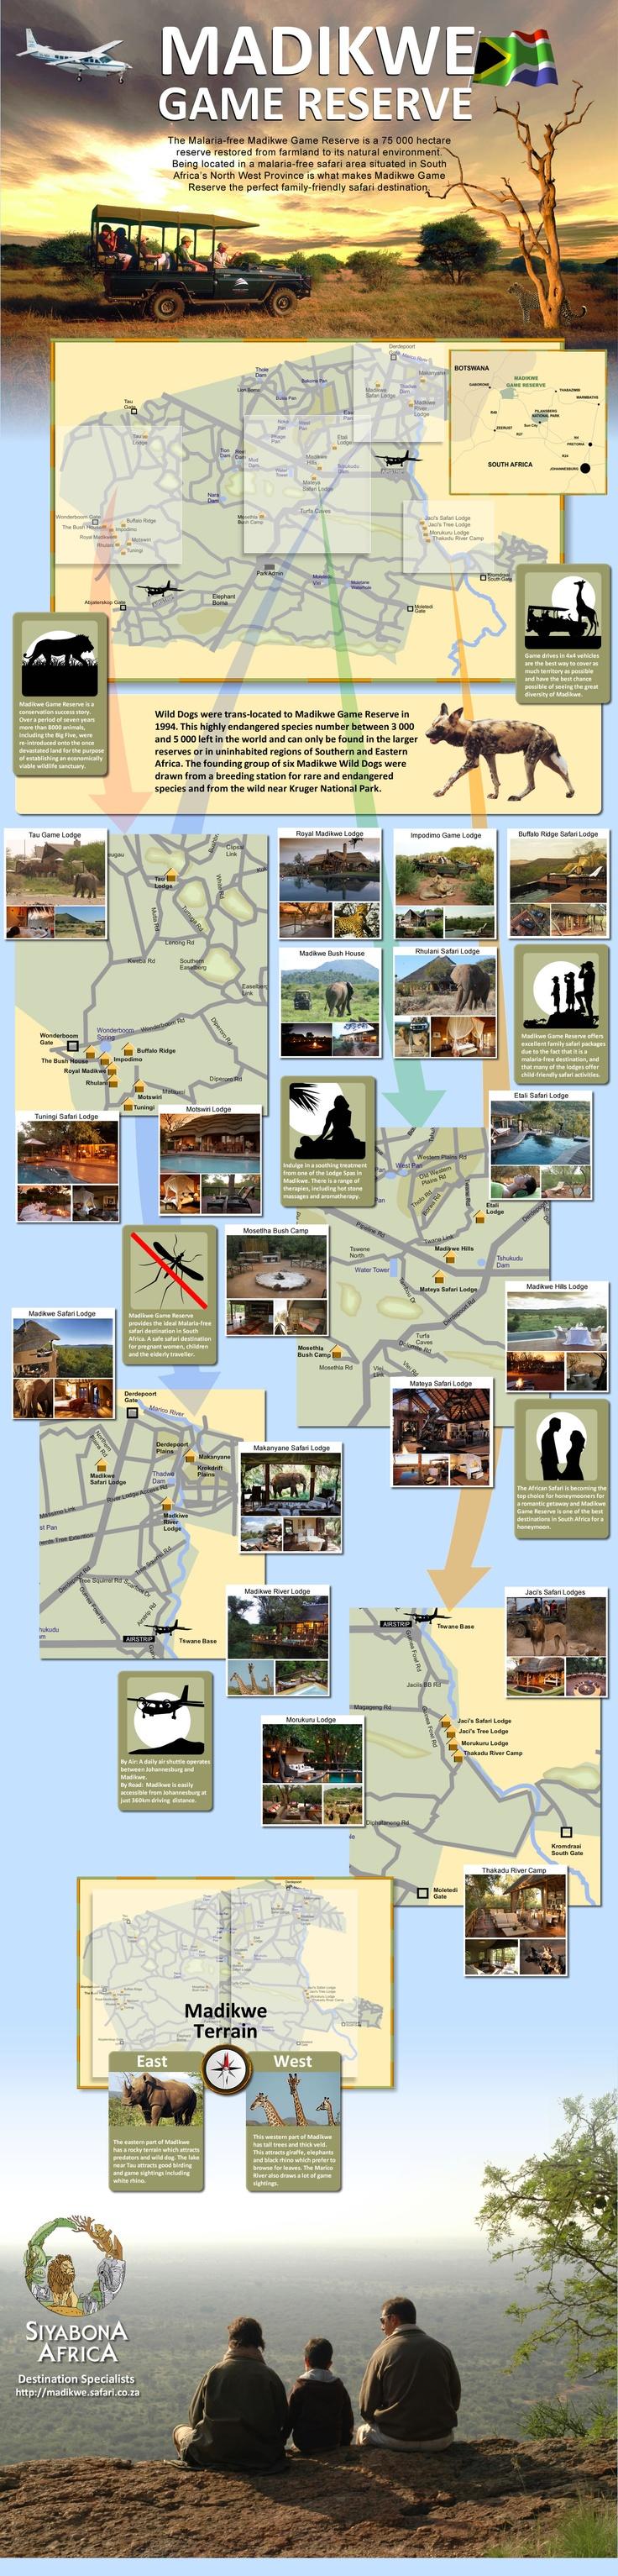 http://madikwe.safari.co.za/images/madikwe-infographic.jpg